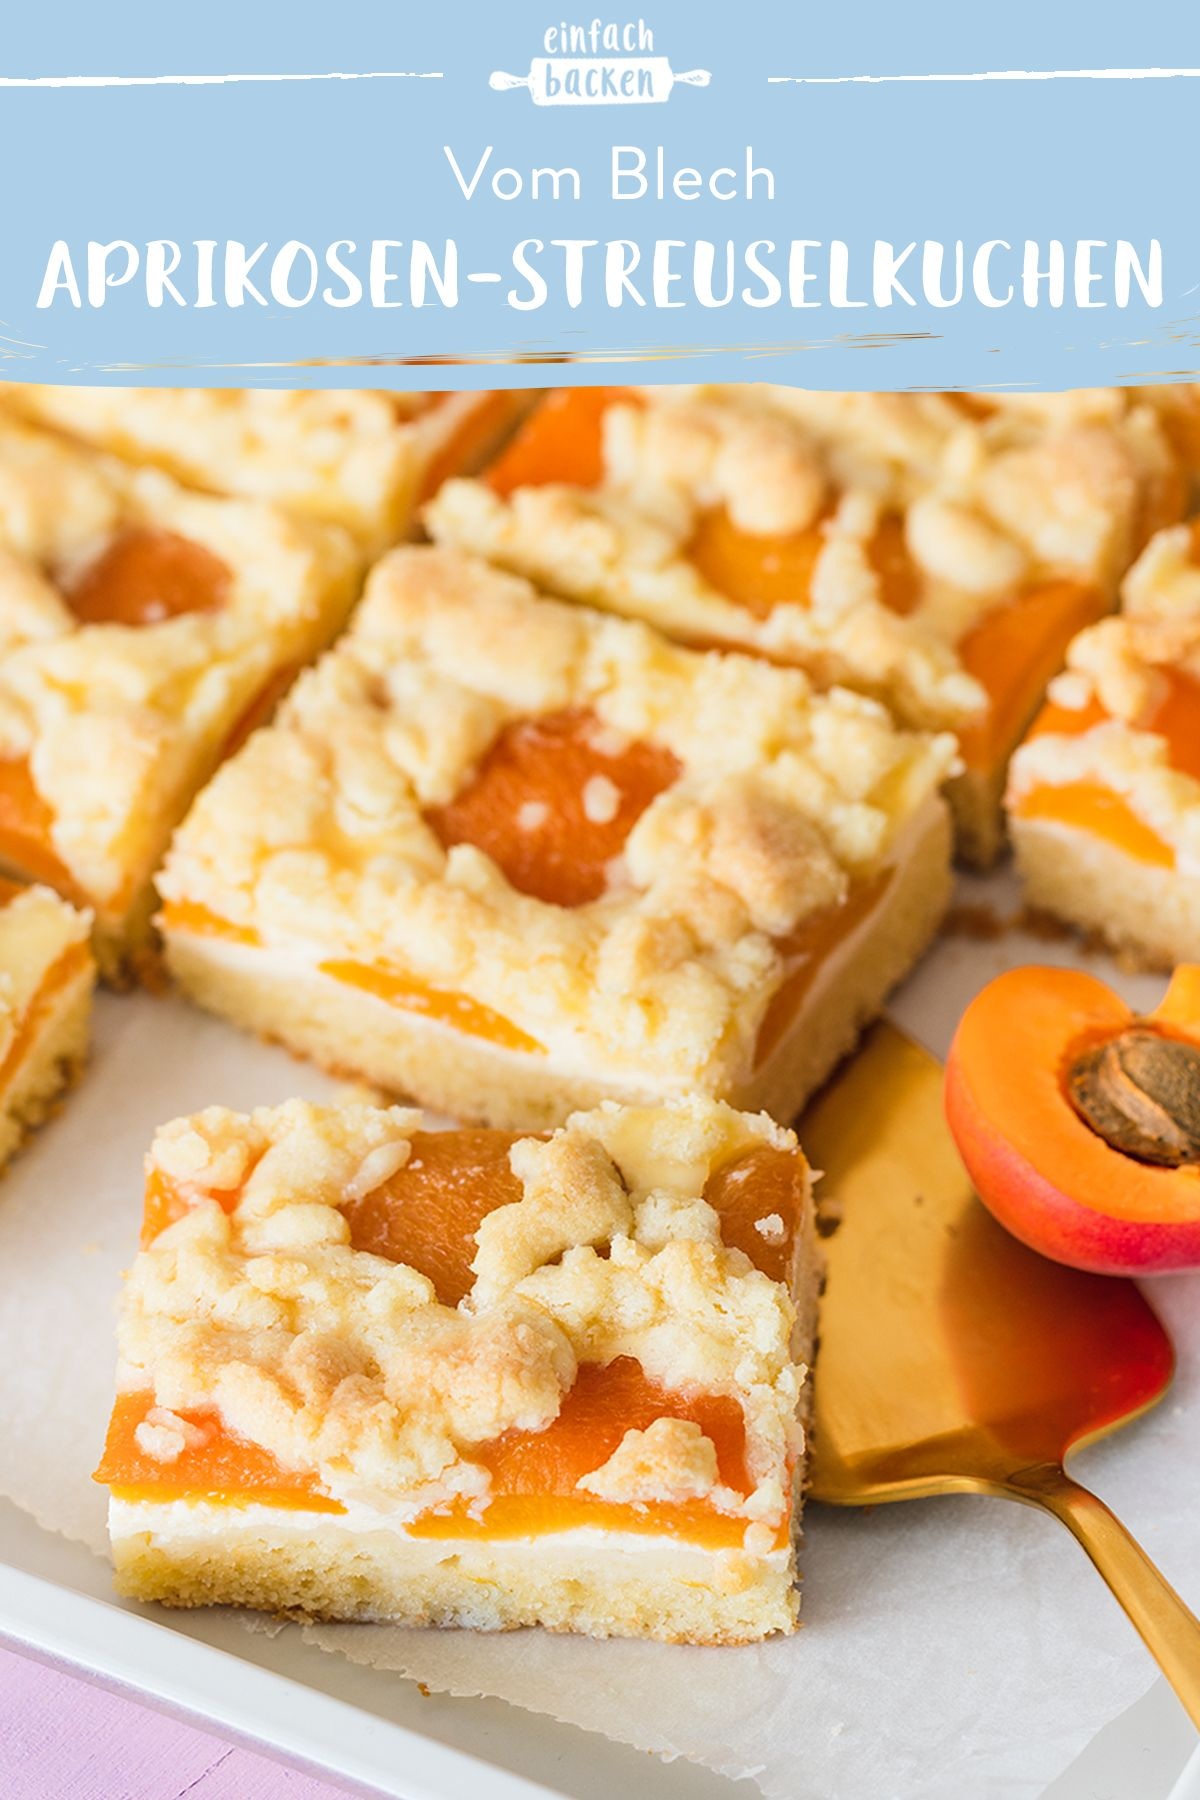 Aprikosen-Blechkuchen mit Streusel